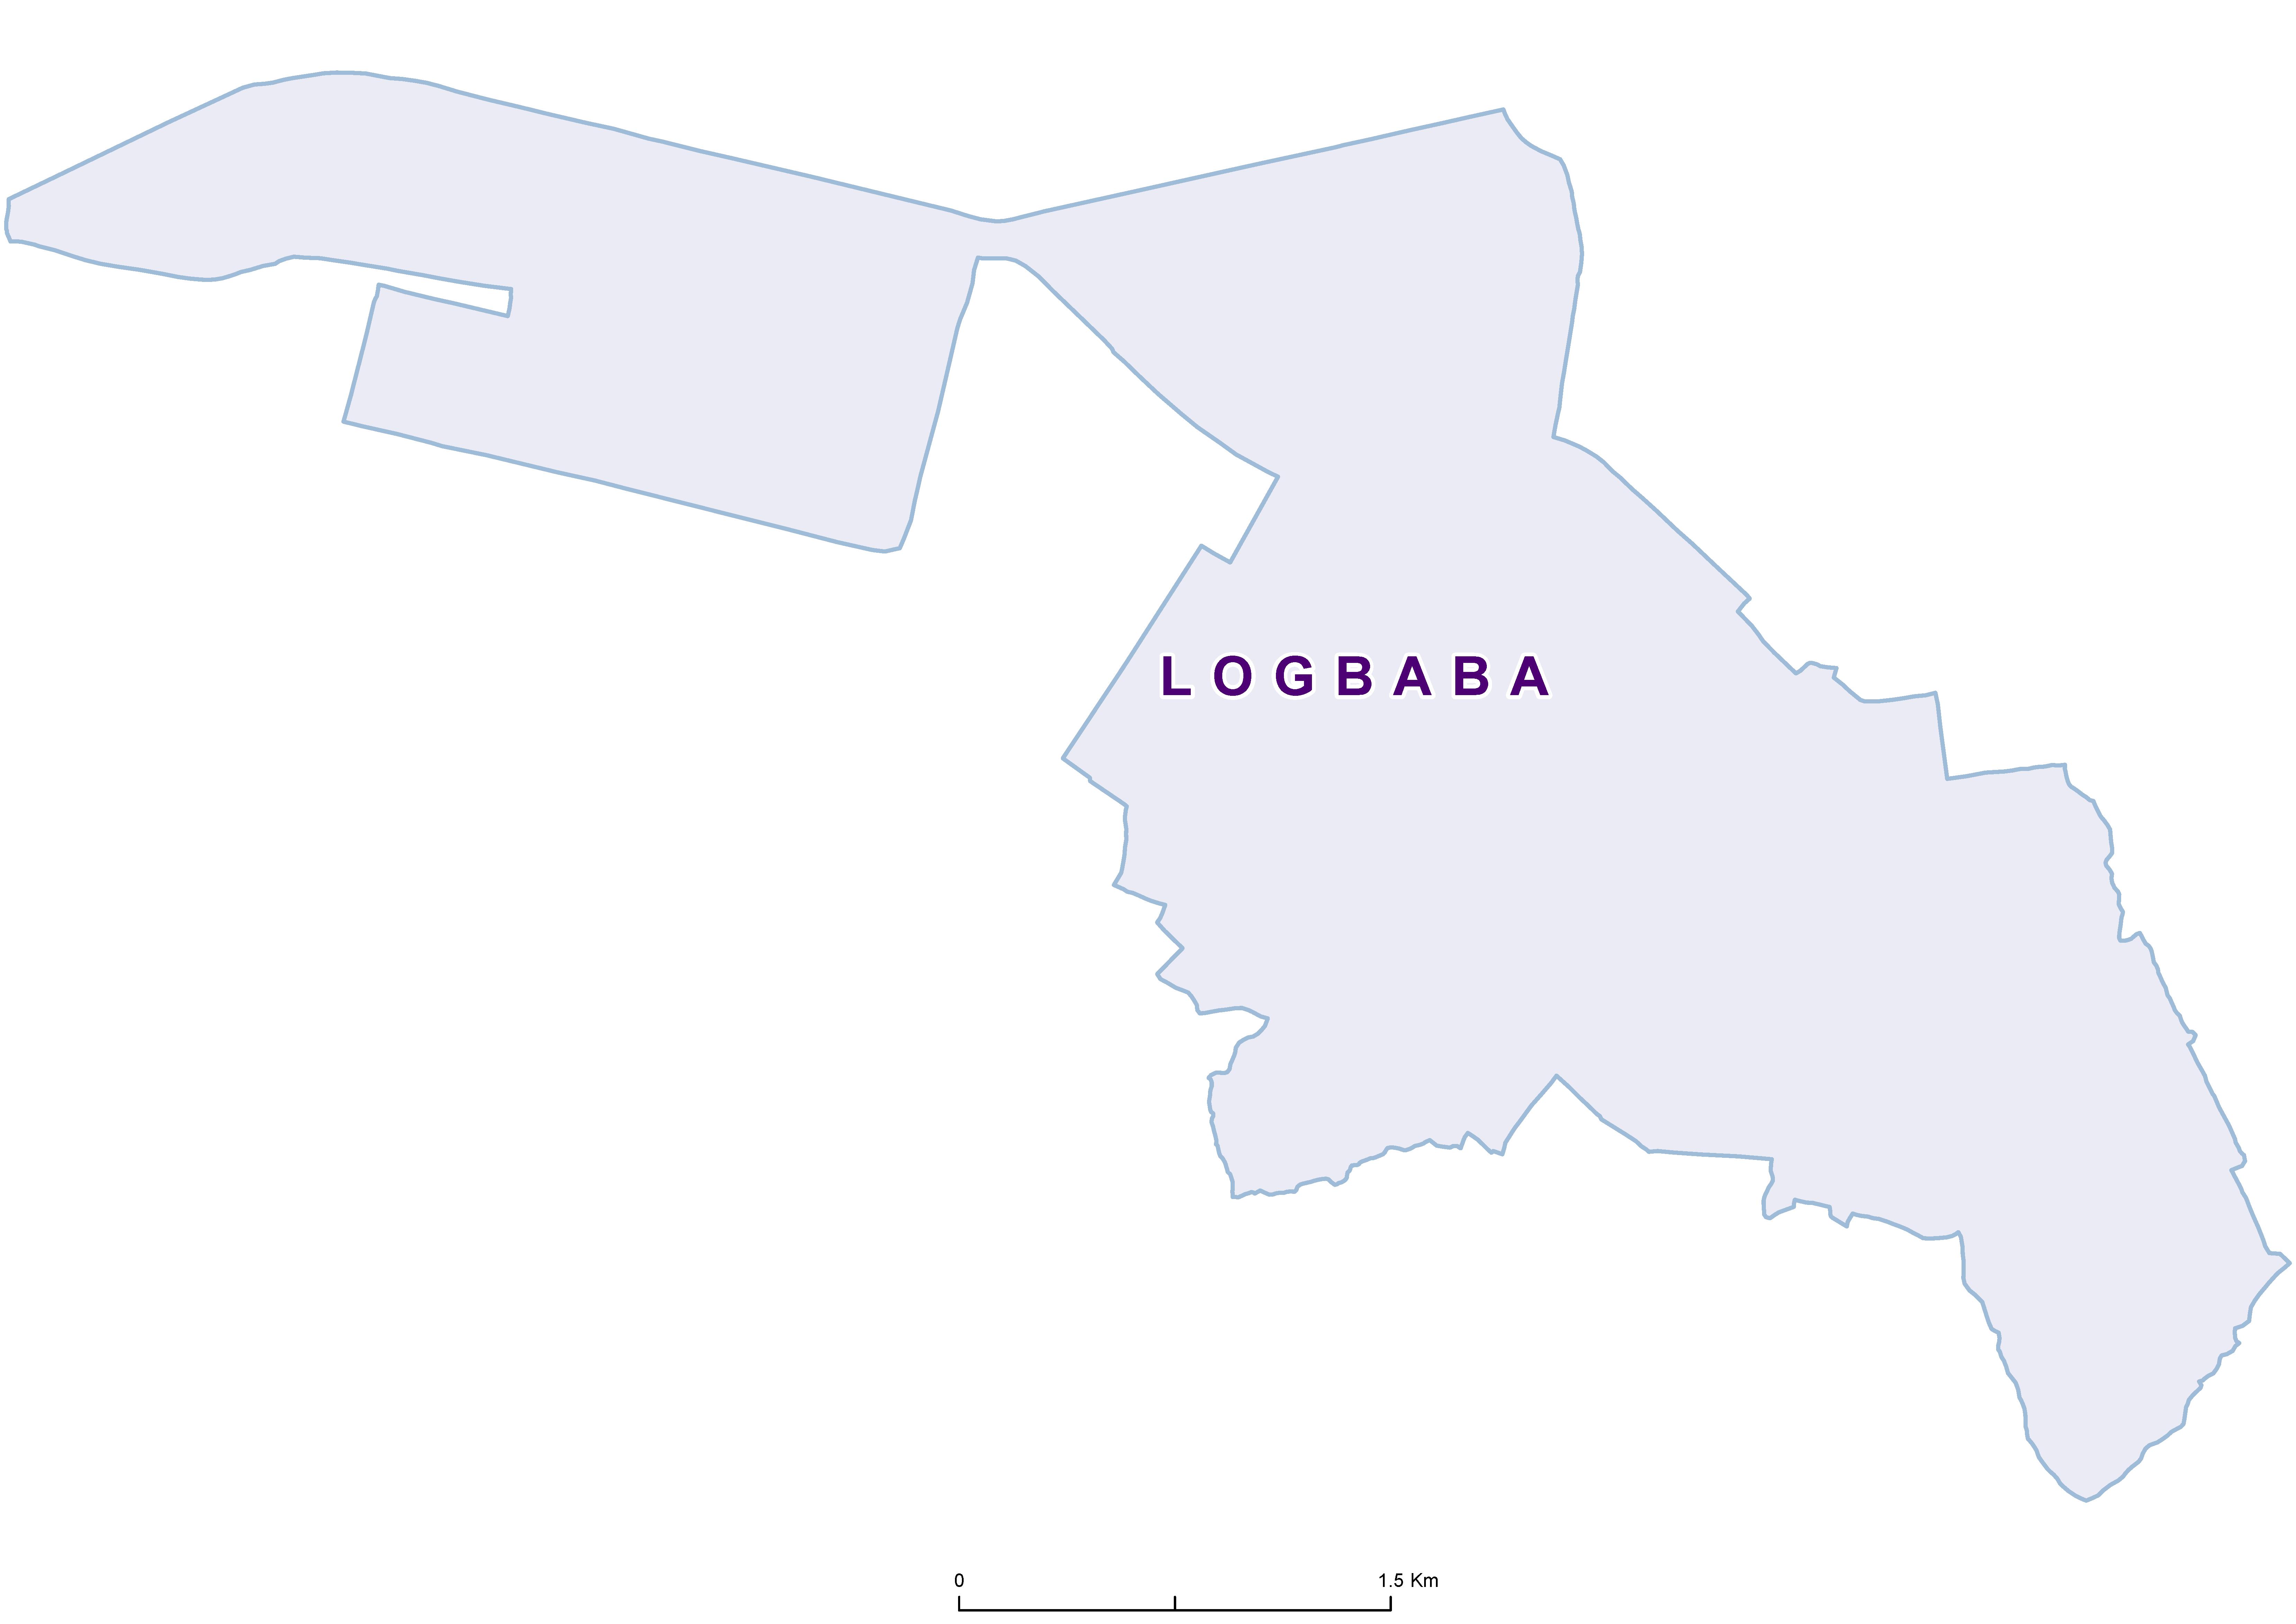 Logbaba Mean STH 19850001